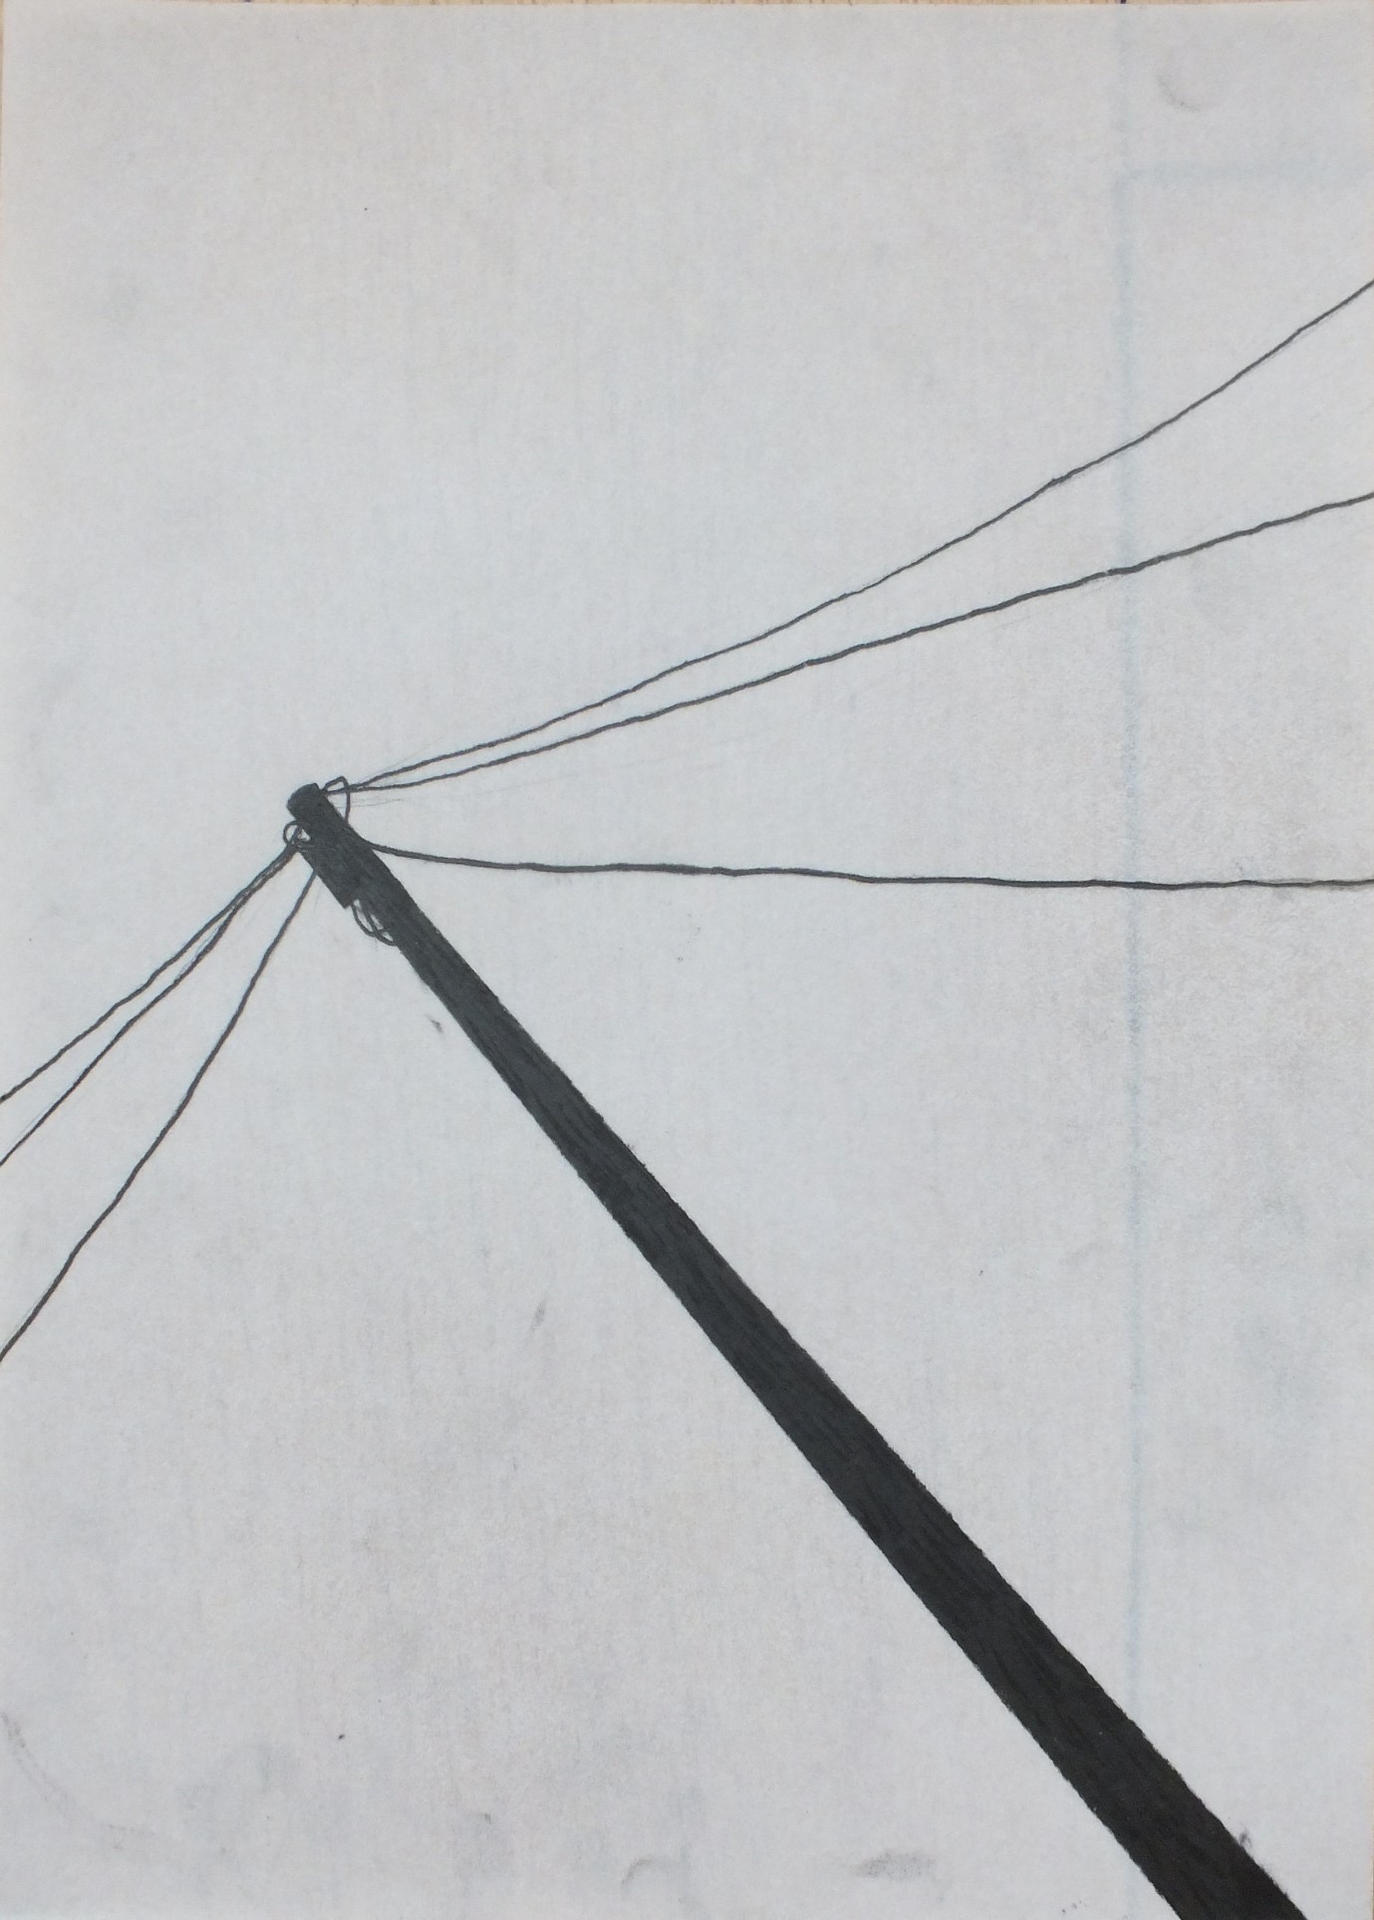 Lines (1/3)